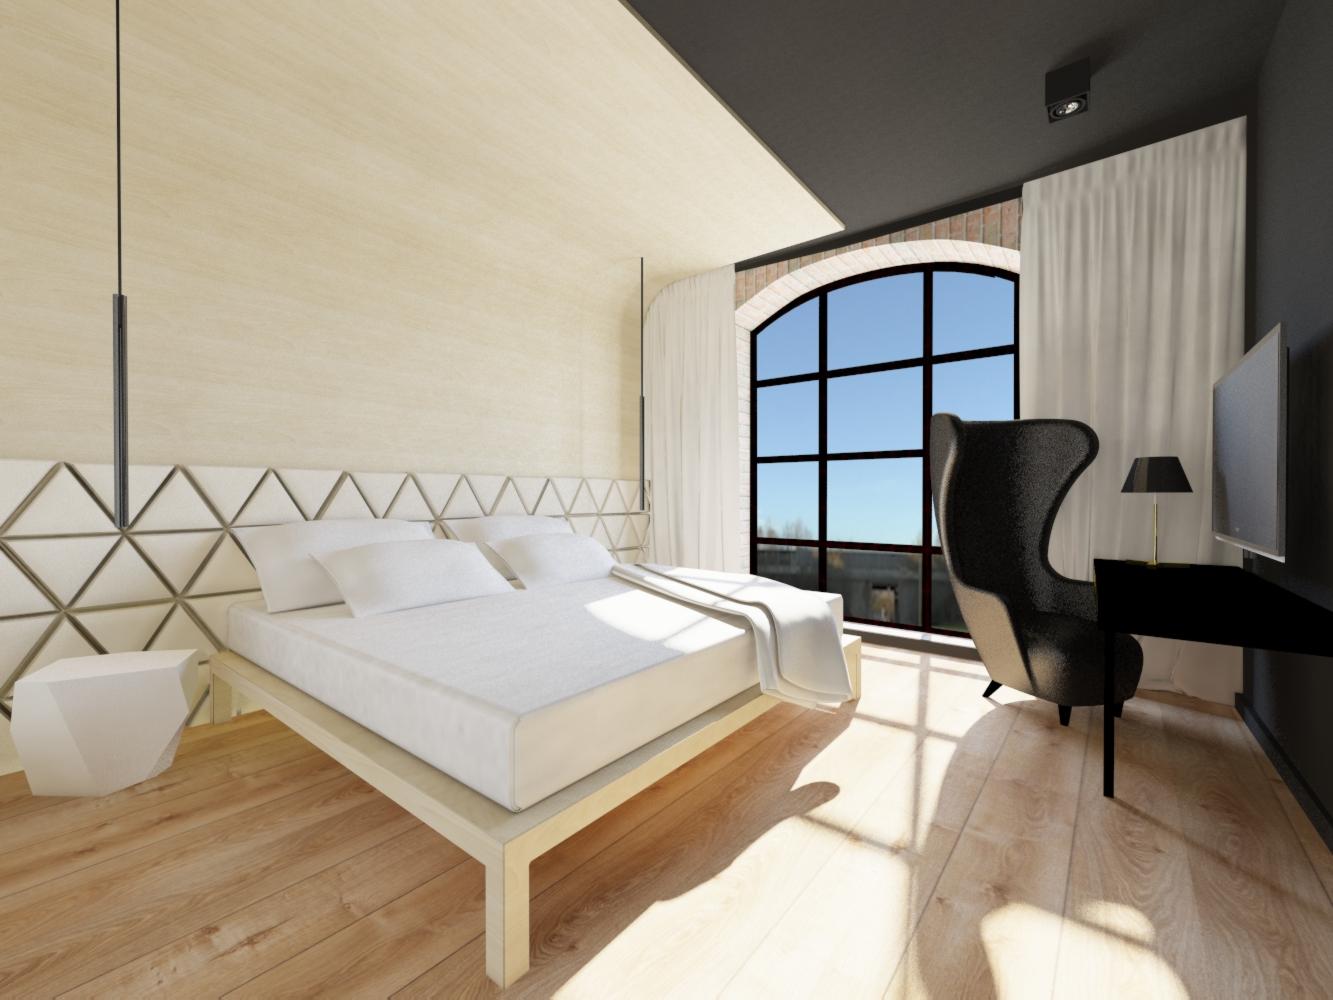 pokoje hotelowe projekt